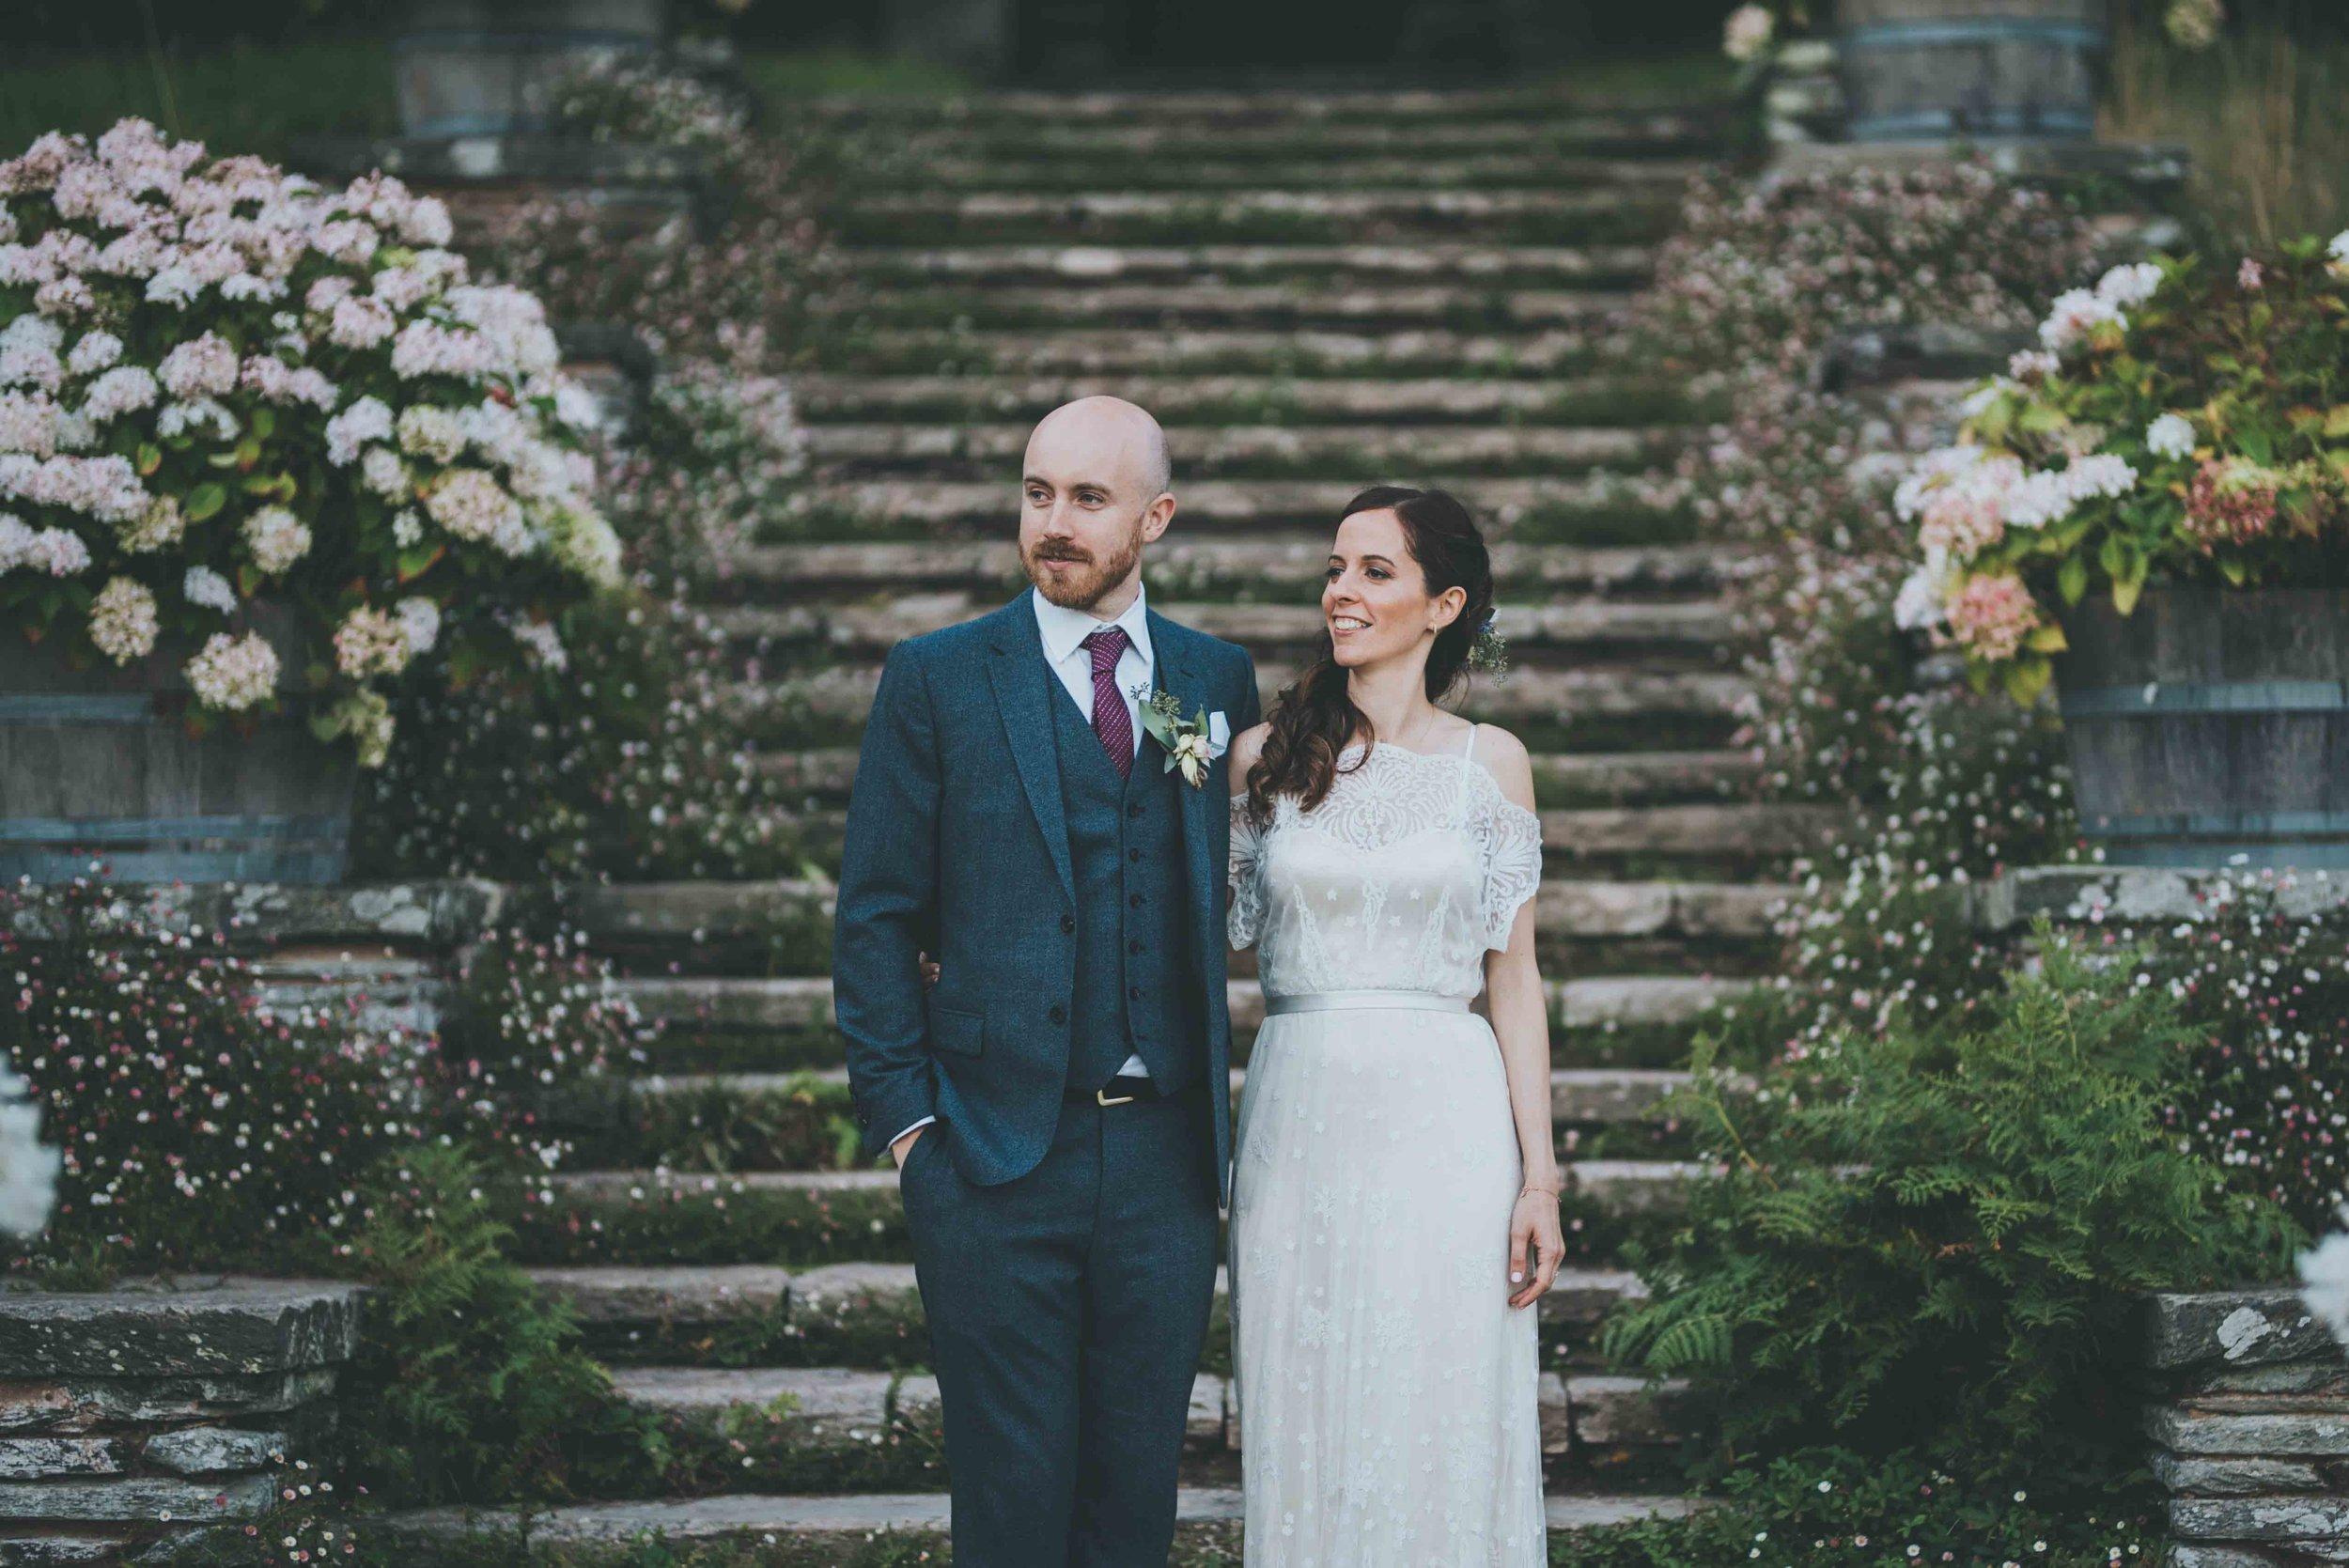 Cristina + John - Hestercombe Gardens, Taunton